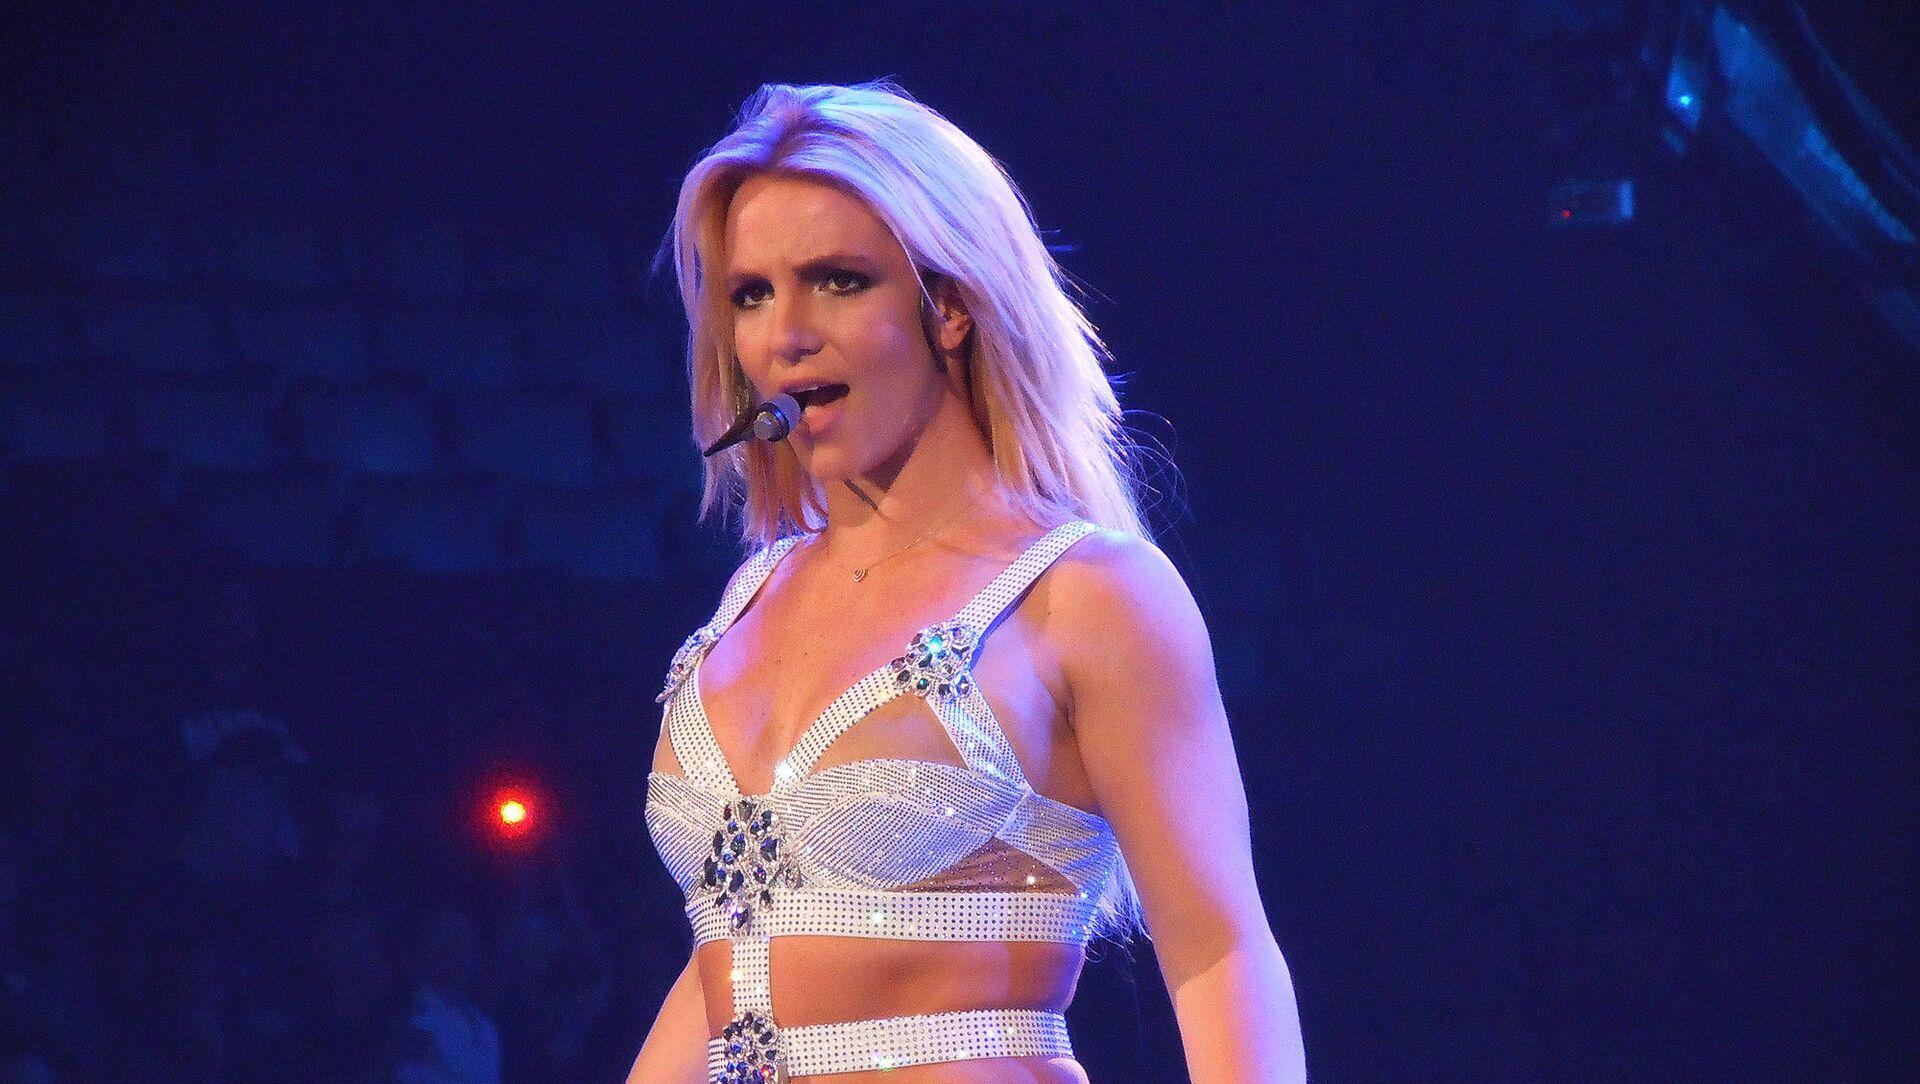 Britney Spears - Sputnik International, 1920, 24.07.2021